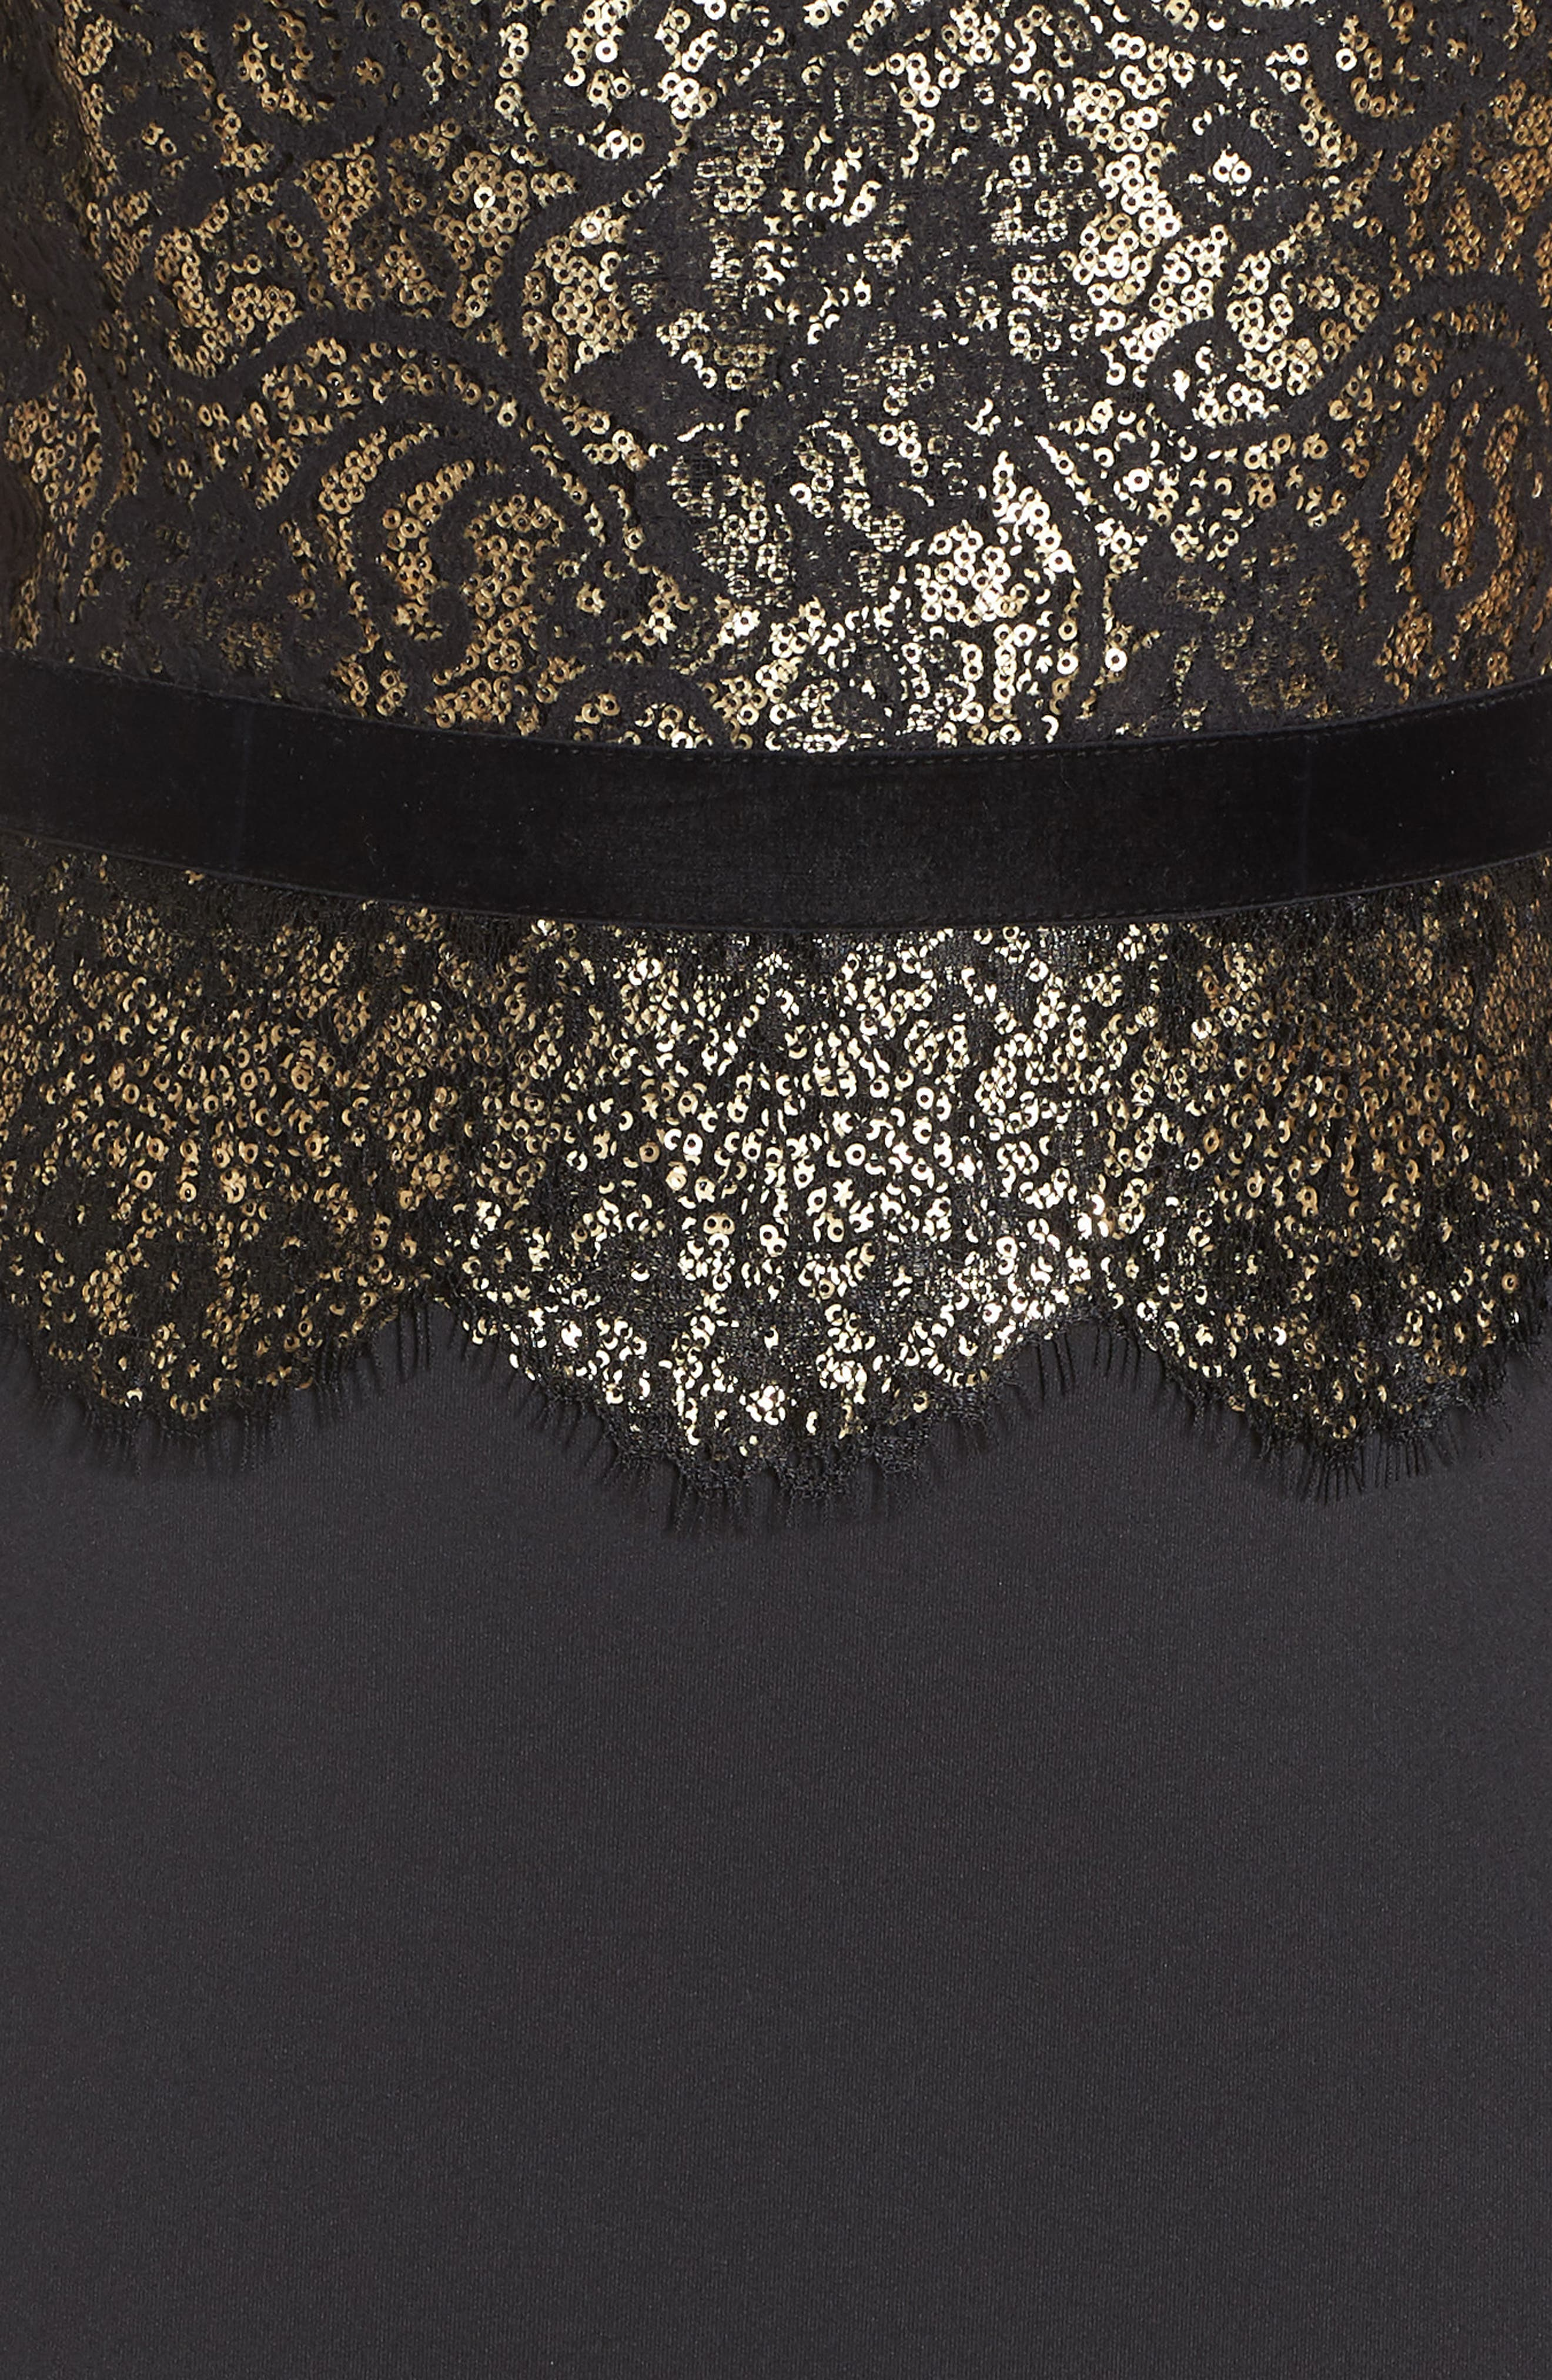 Lace Inset Scuba Dress,                             Alternate thumbnail 7, color,                             BLACK/ GOLD